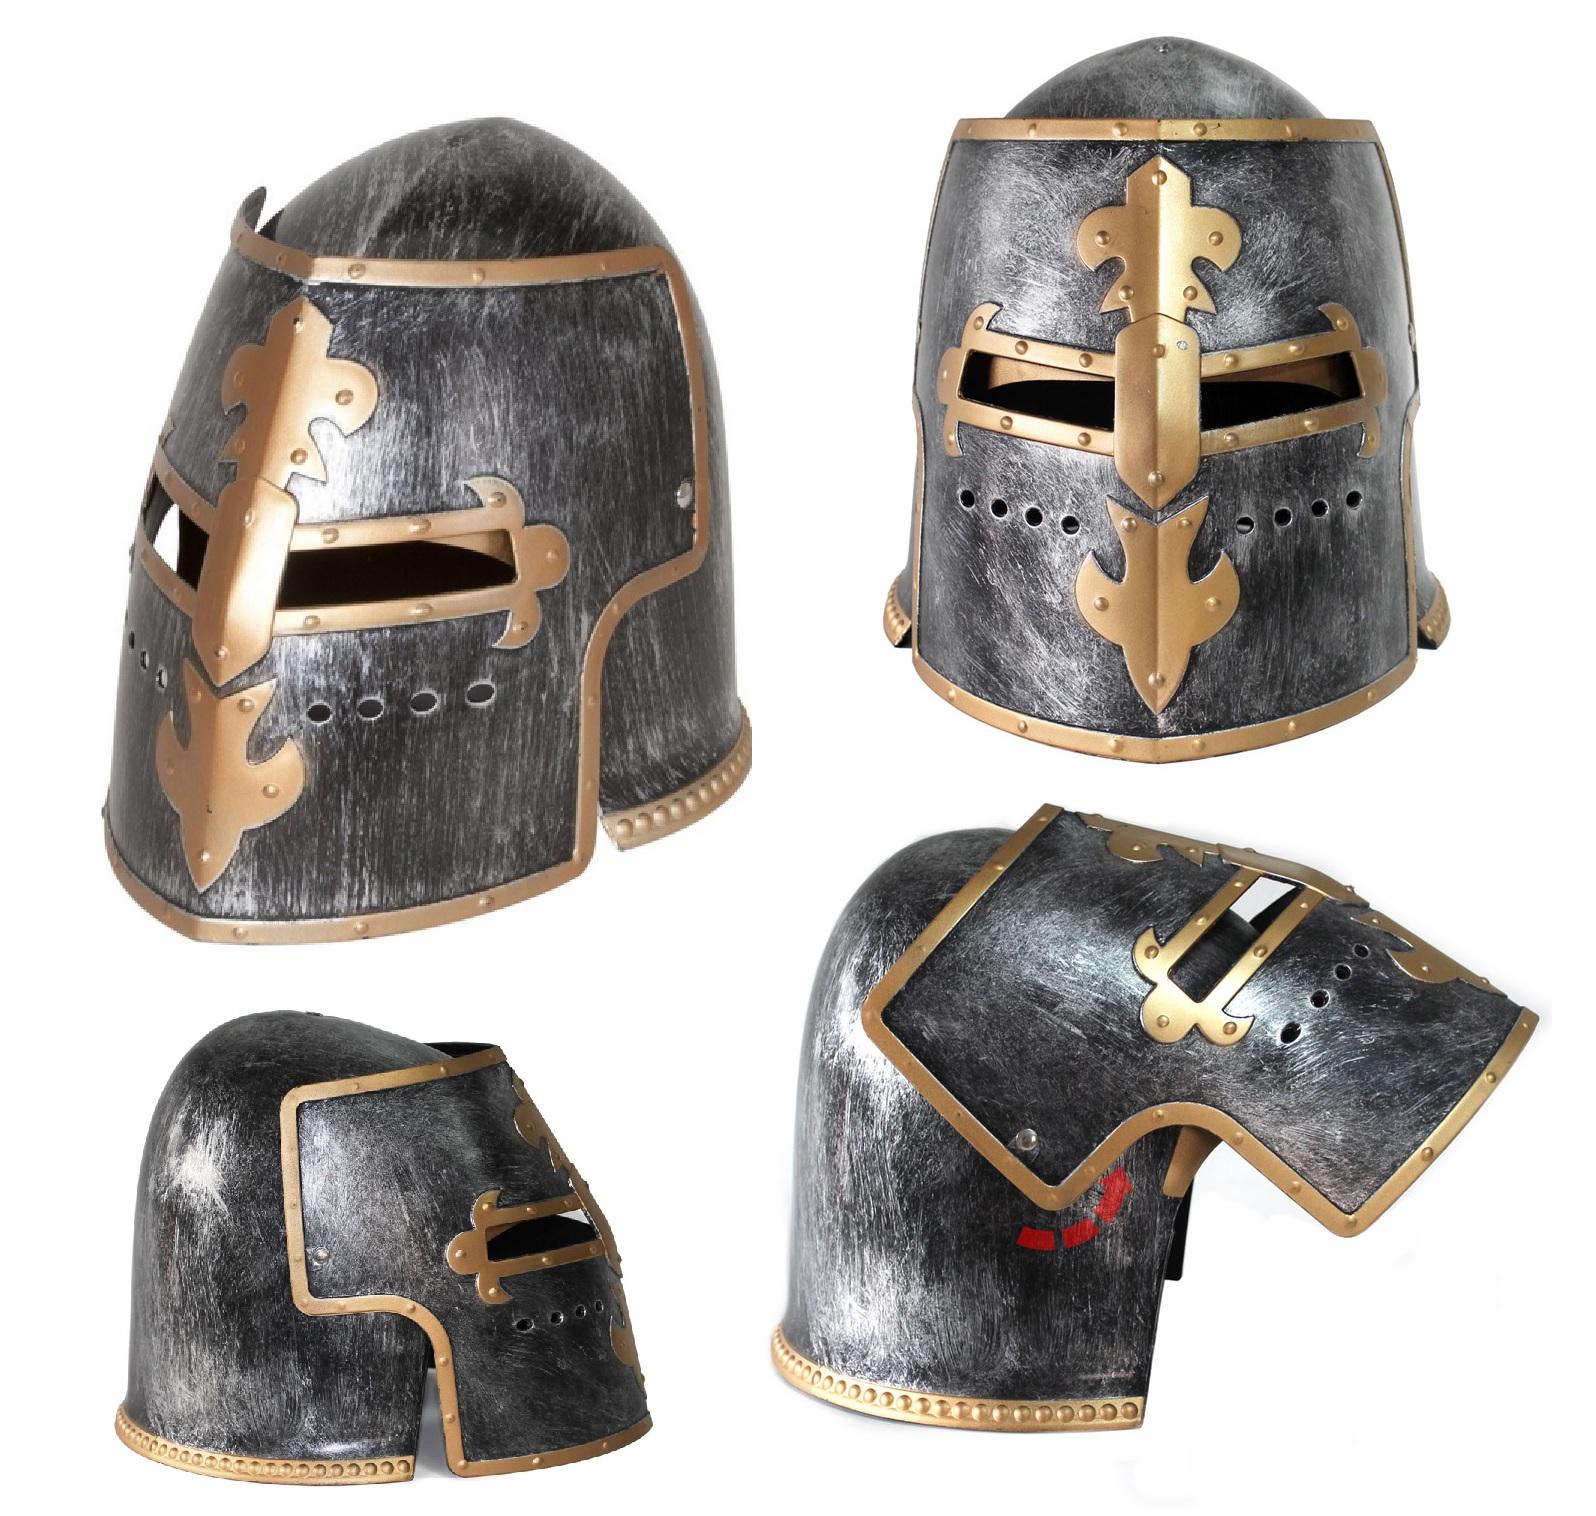 thumbnail 21 - Silver Pewter Knight Roman Armor Crusader Helmet Mask Medieval Adult Costume